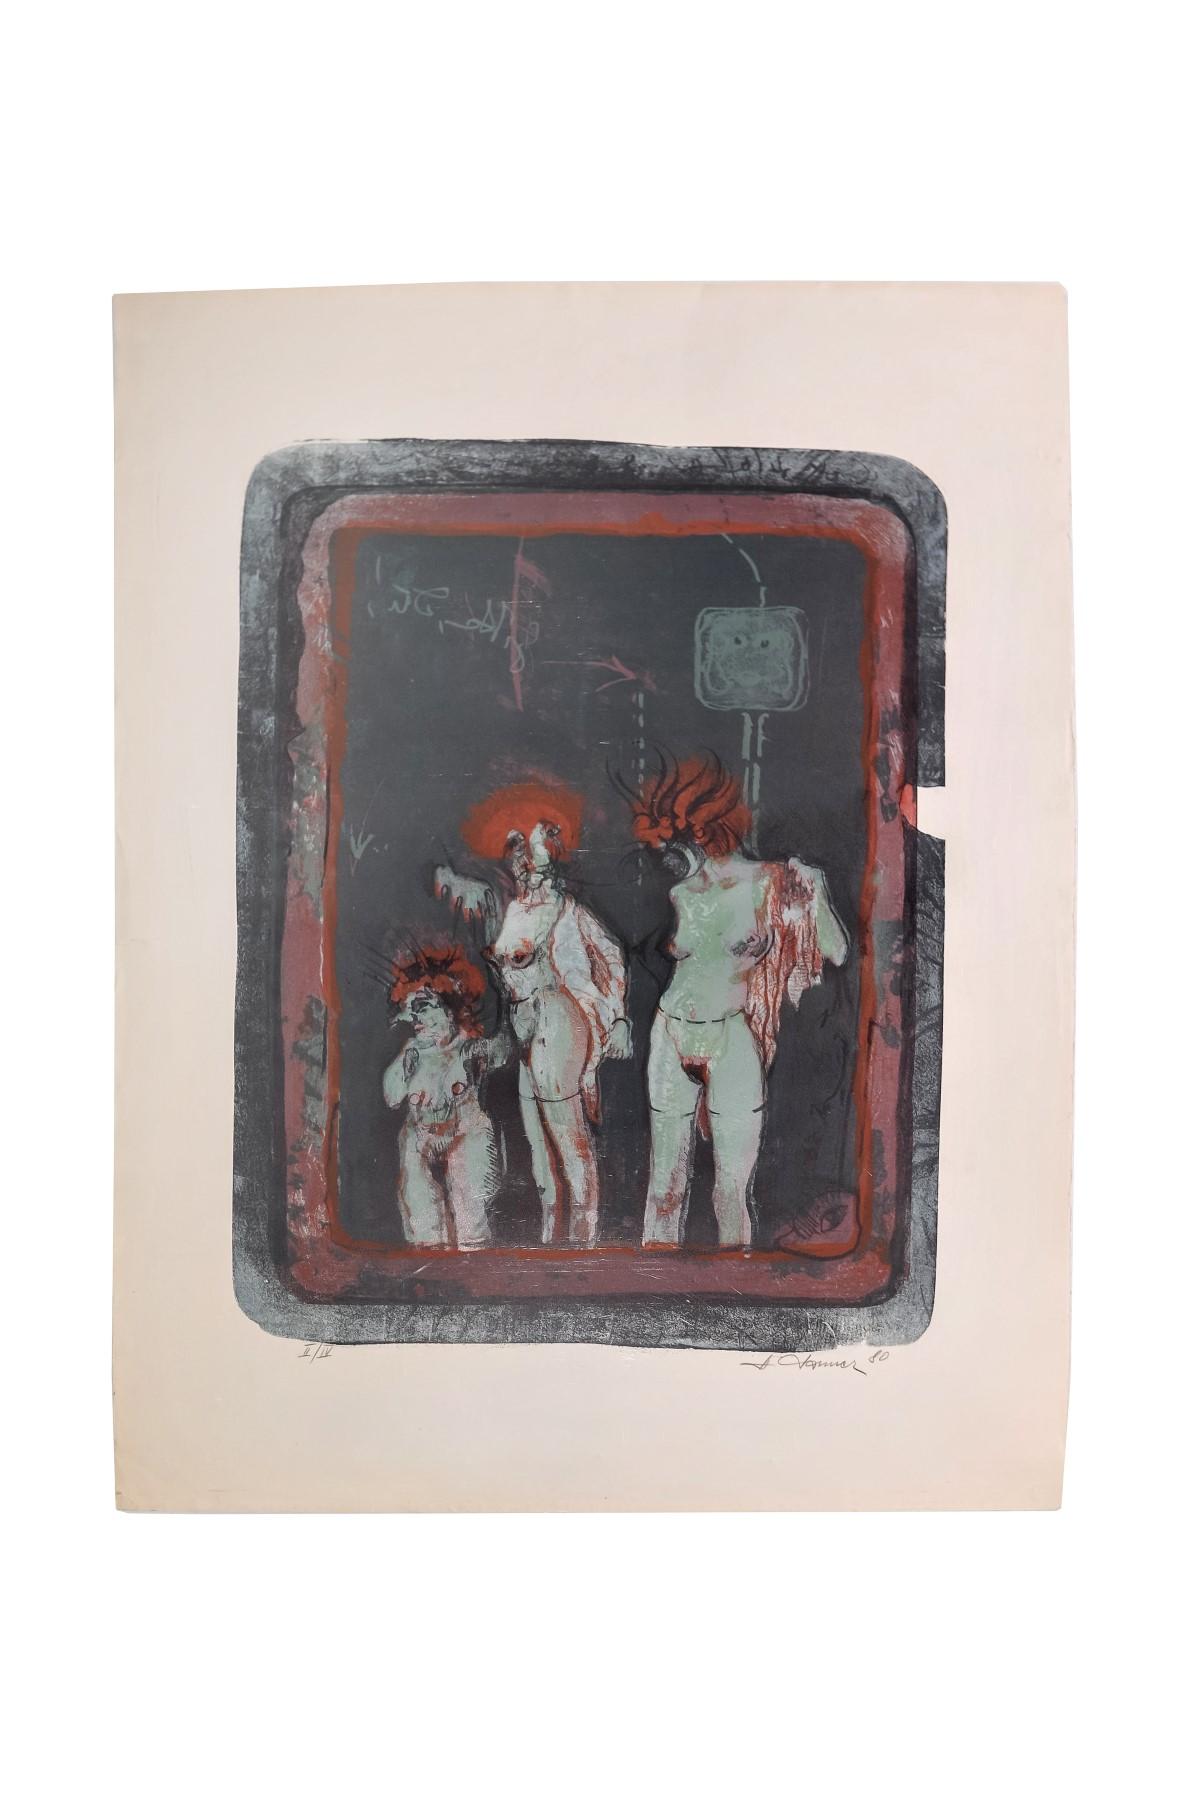 #21 Artist of the 20th century, Figurative Composition. | Künstler des 20. Jahrhundert, Figurative Komposition Image